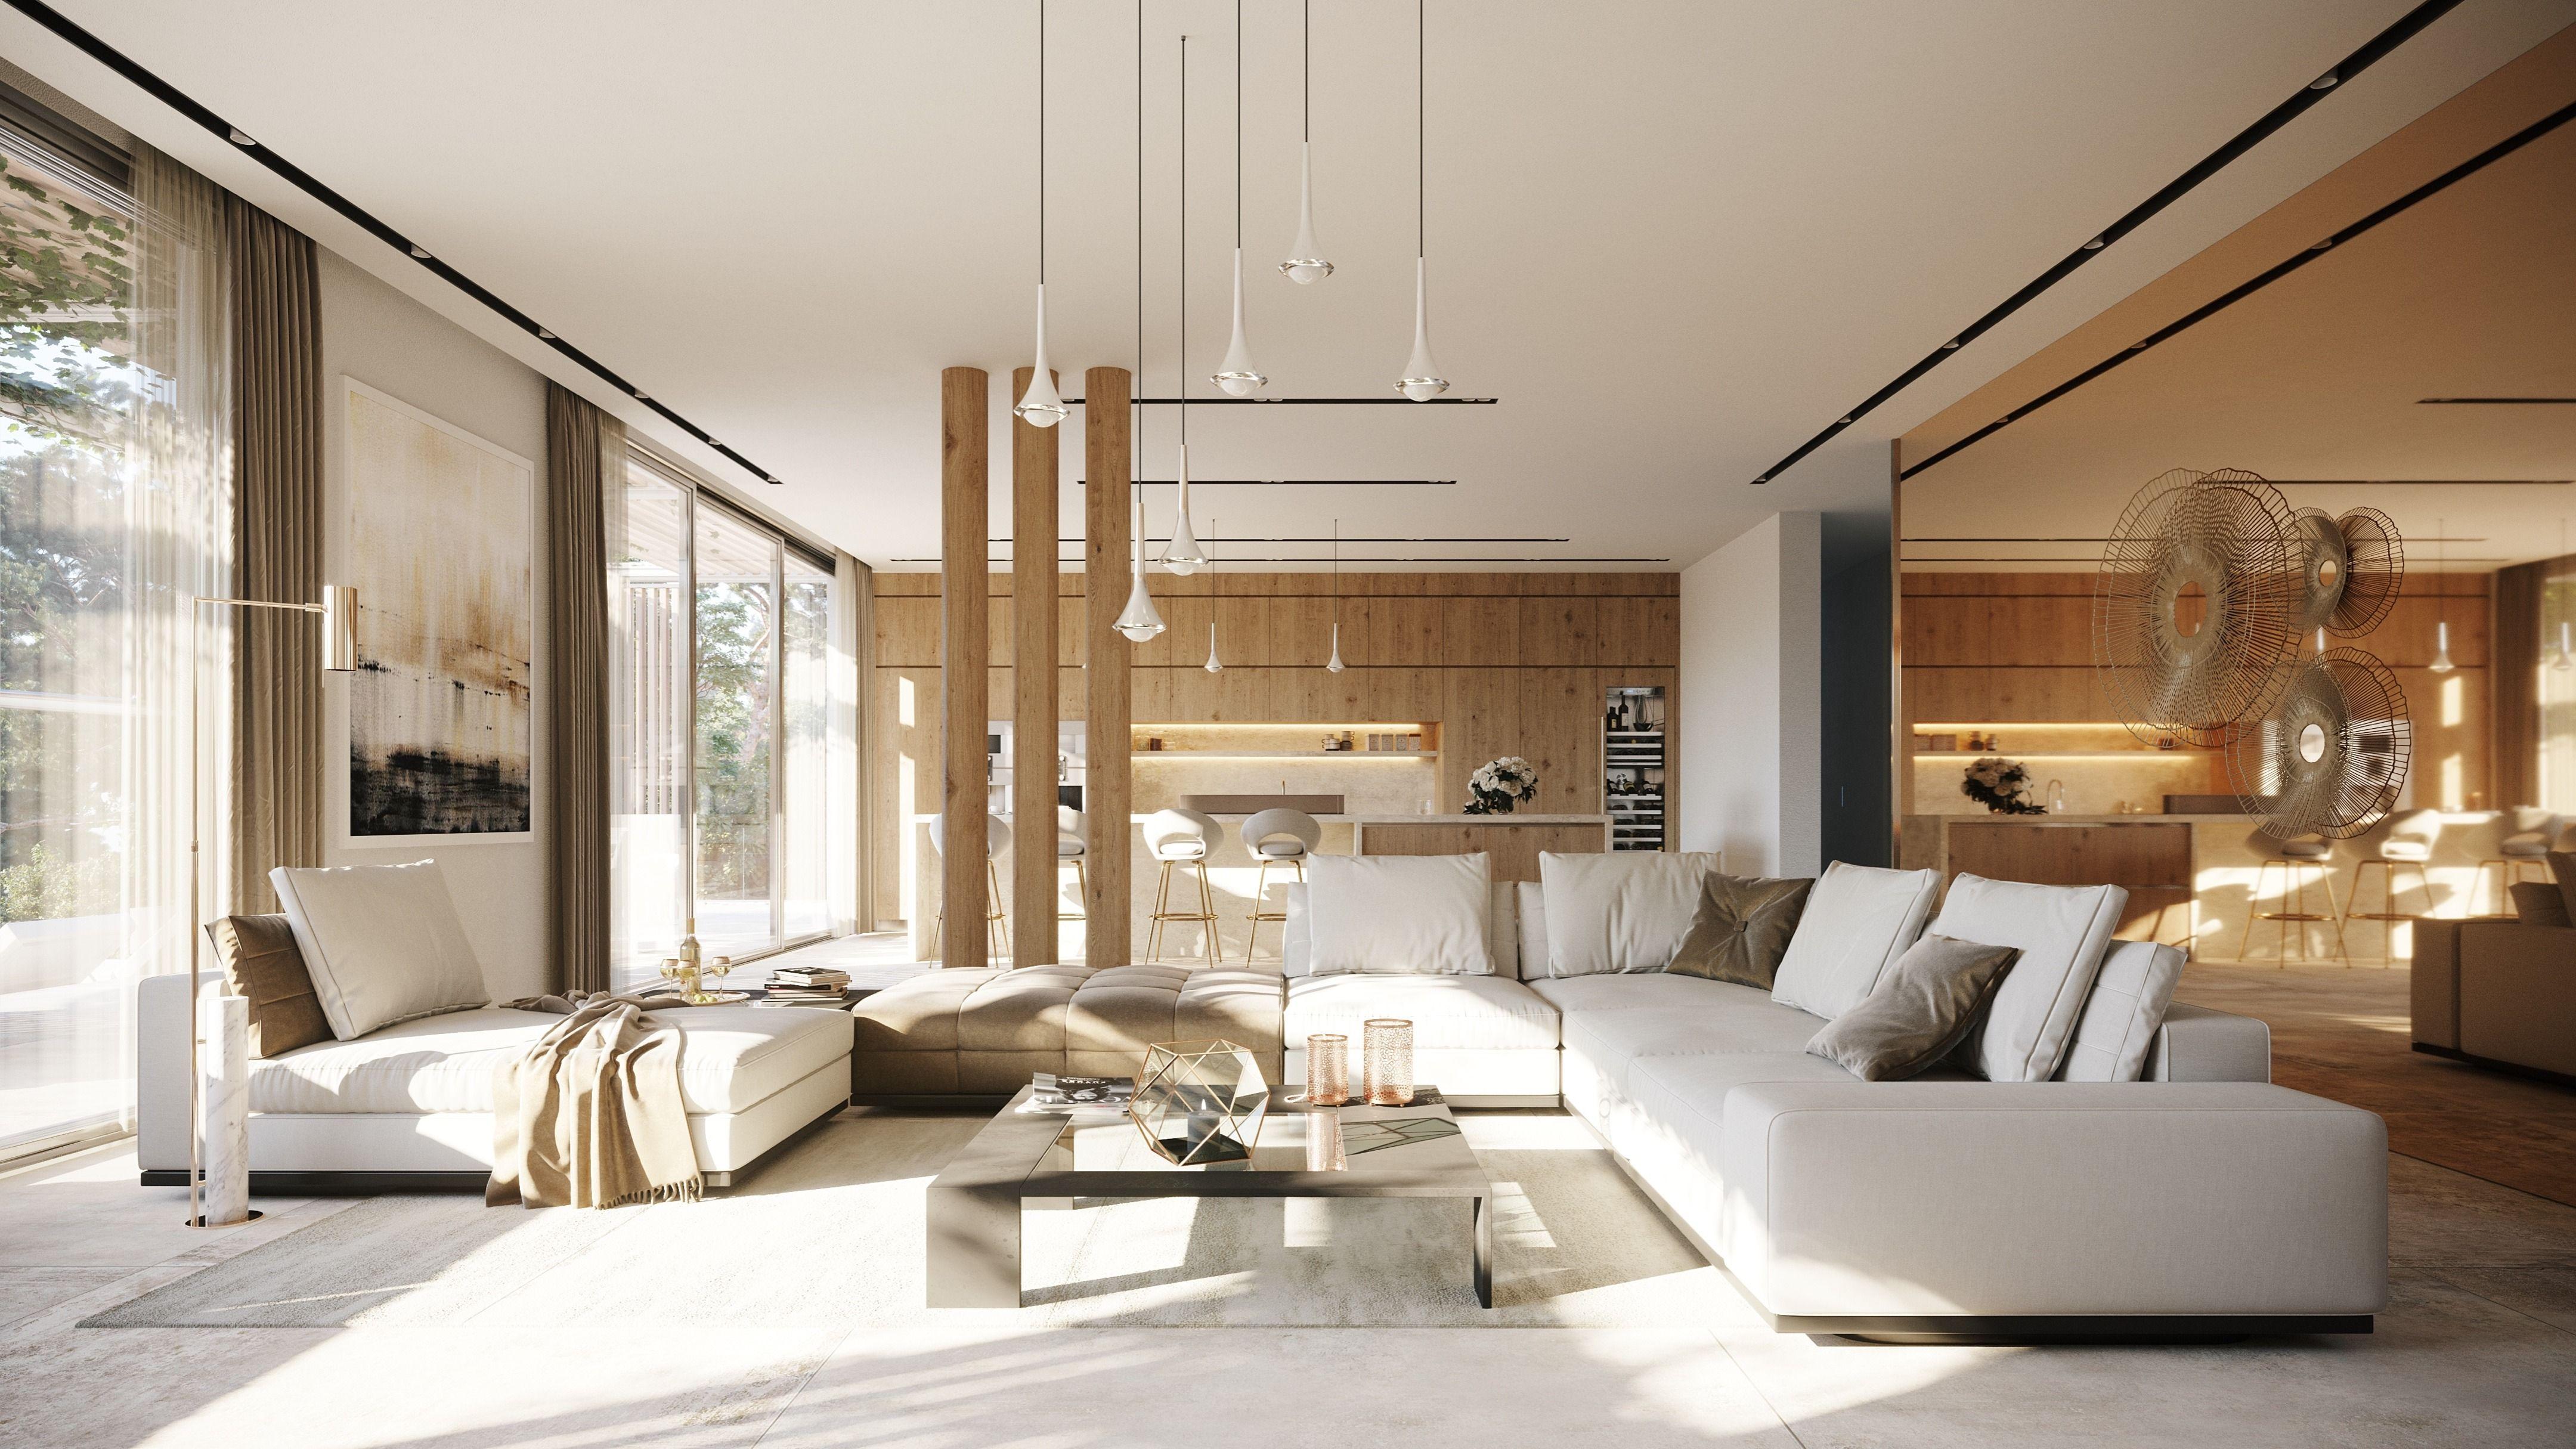 Can Vago Ibiza Picture Gallery Luxury Living Home Decor Design